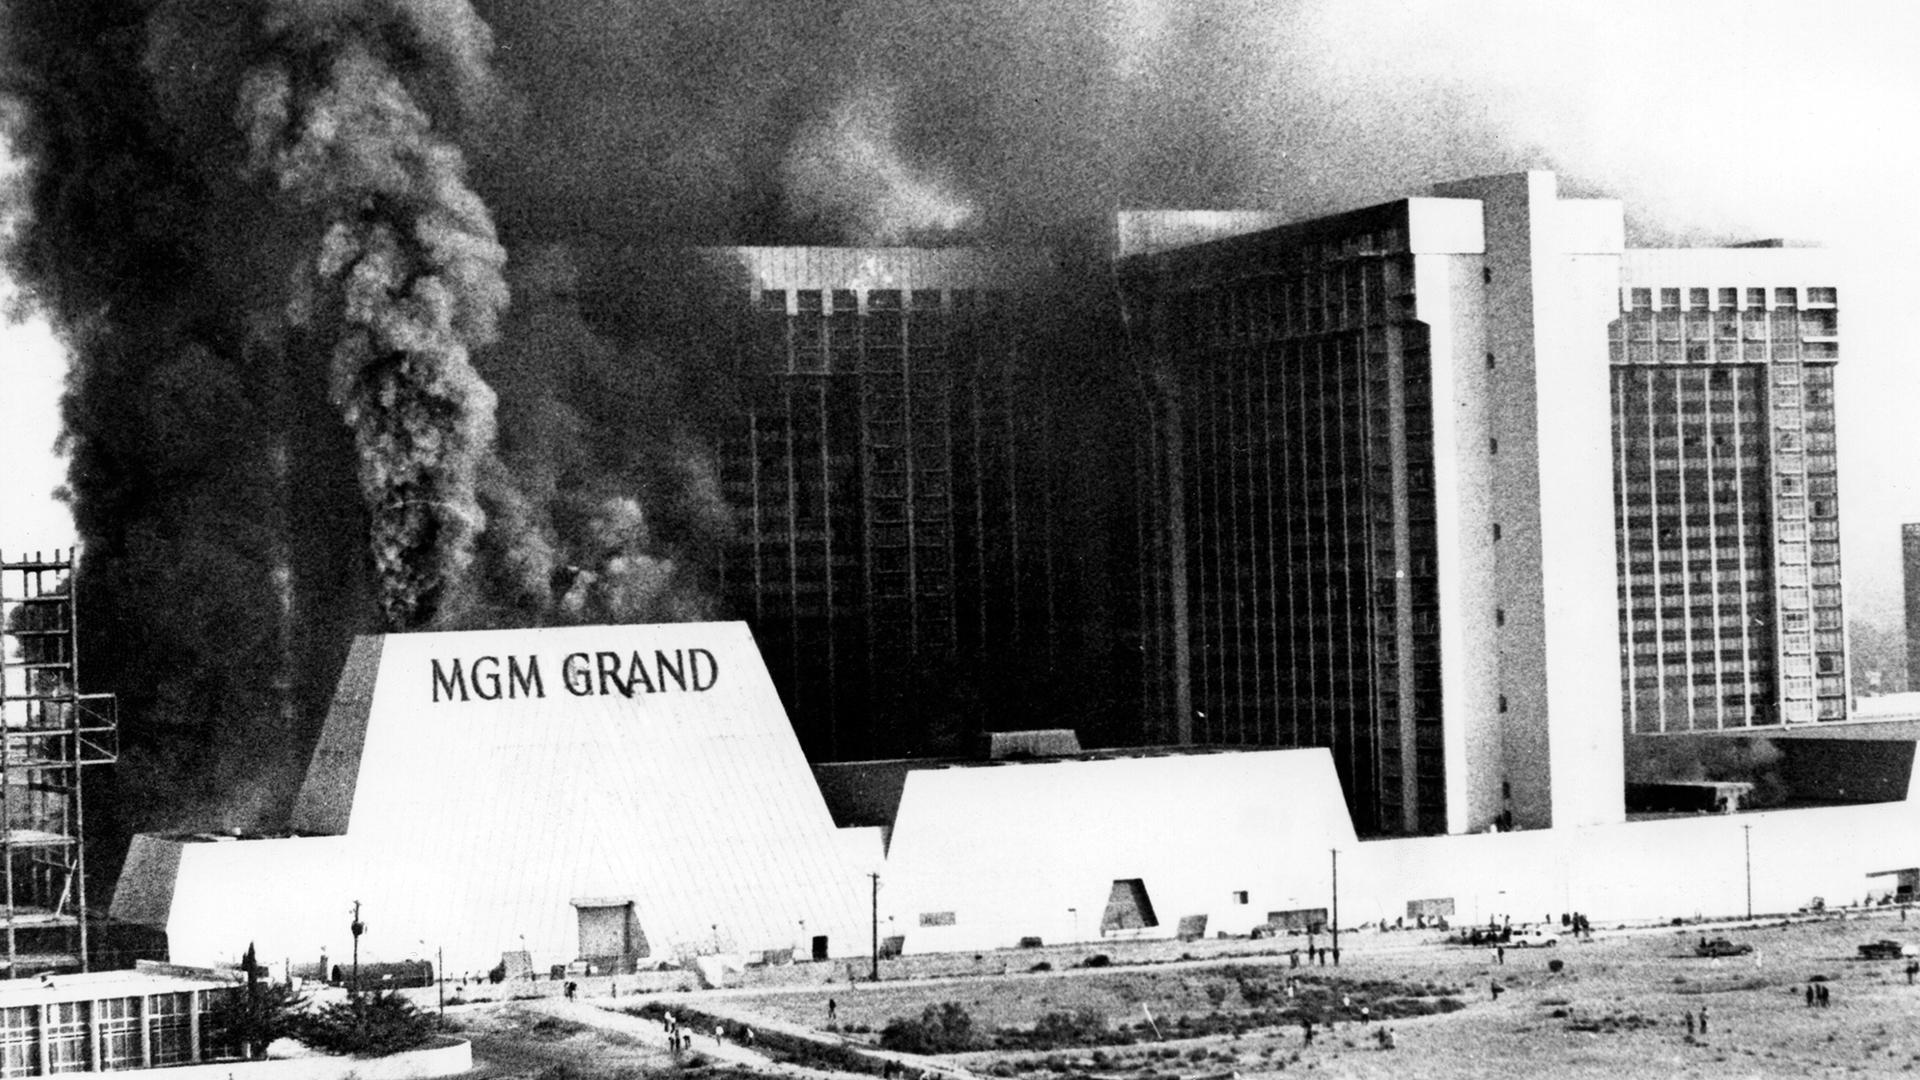 MGM Grand Las Vegas Fire in 1980-159532.jpg33209654